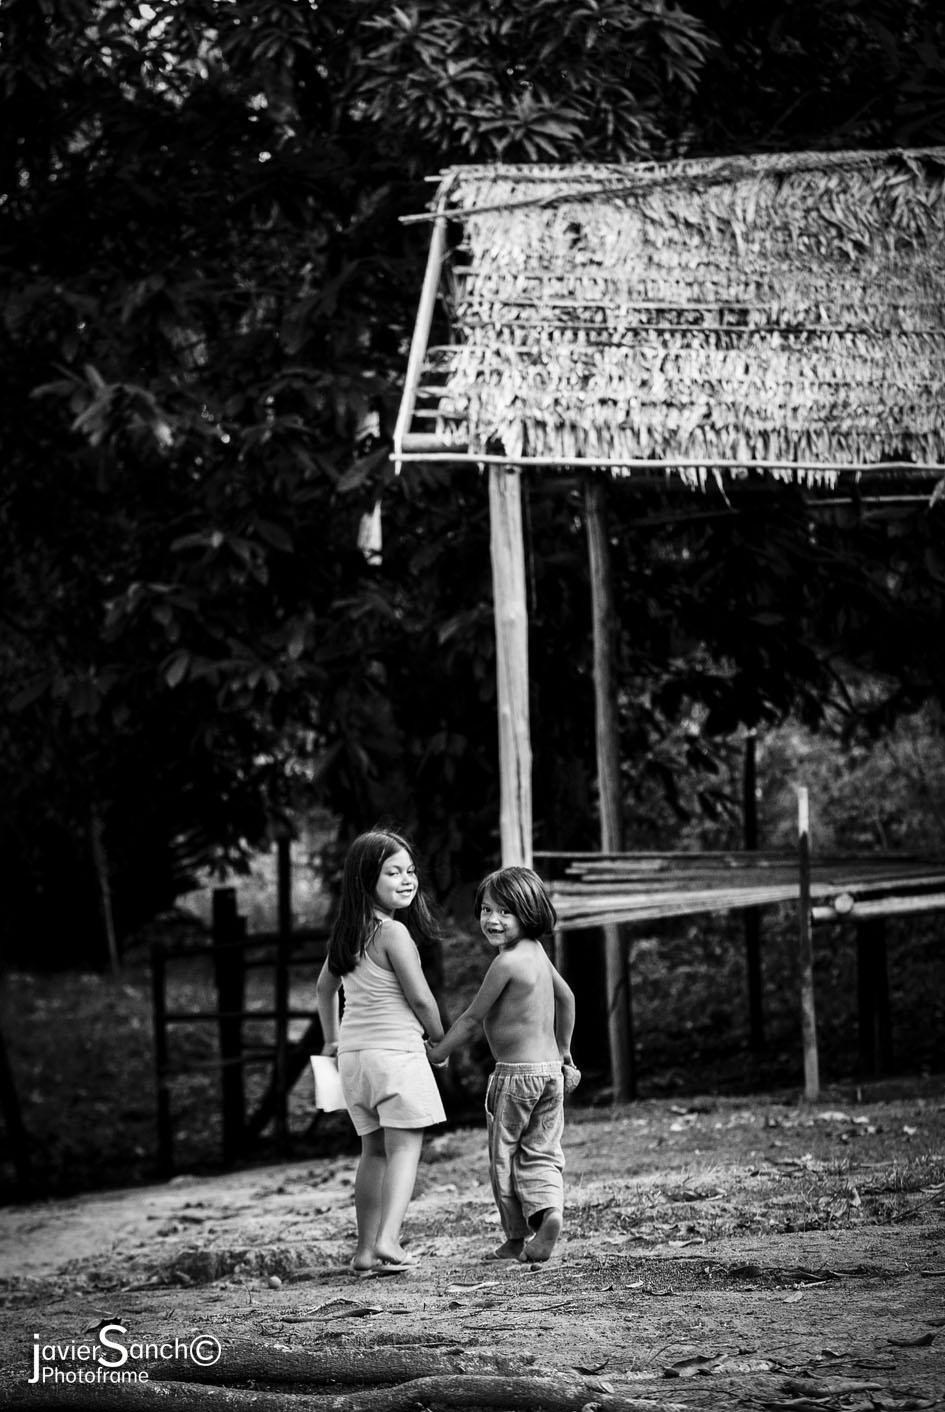 Photoframe Street Photography